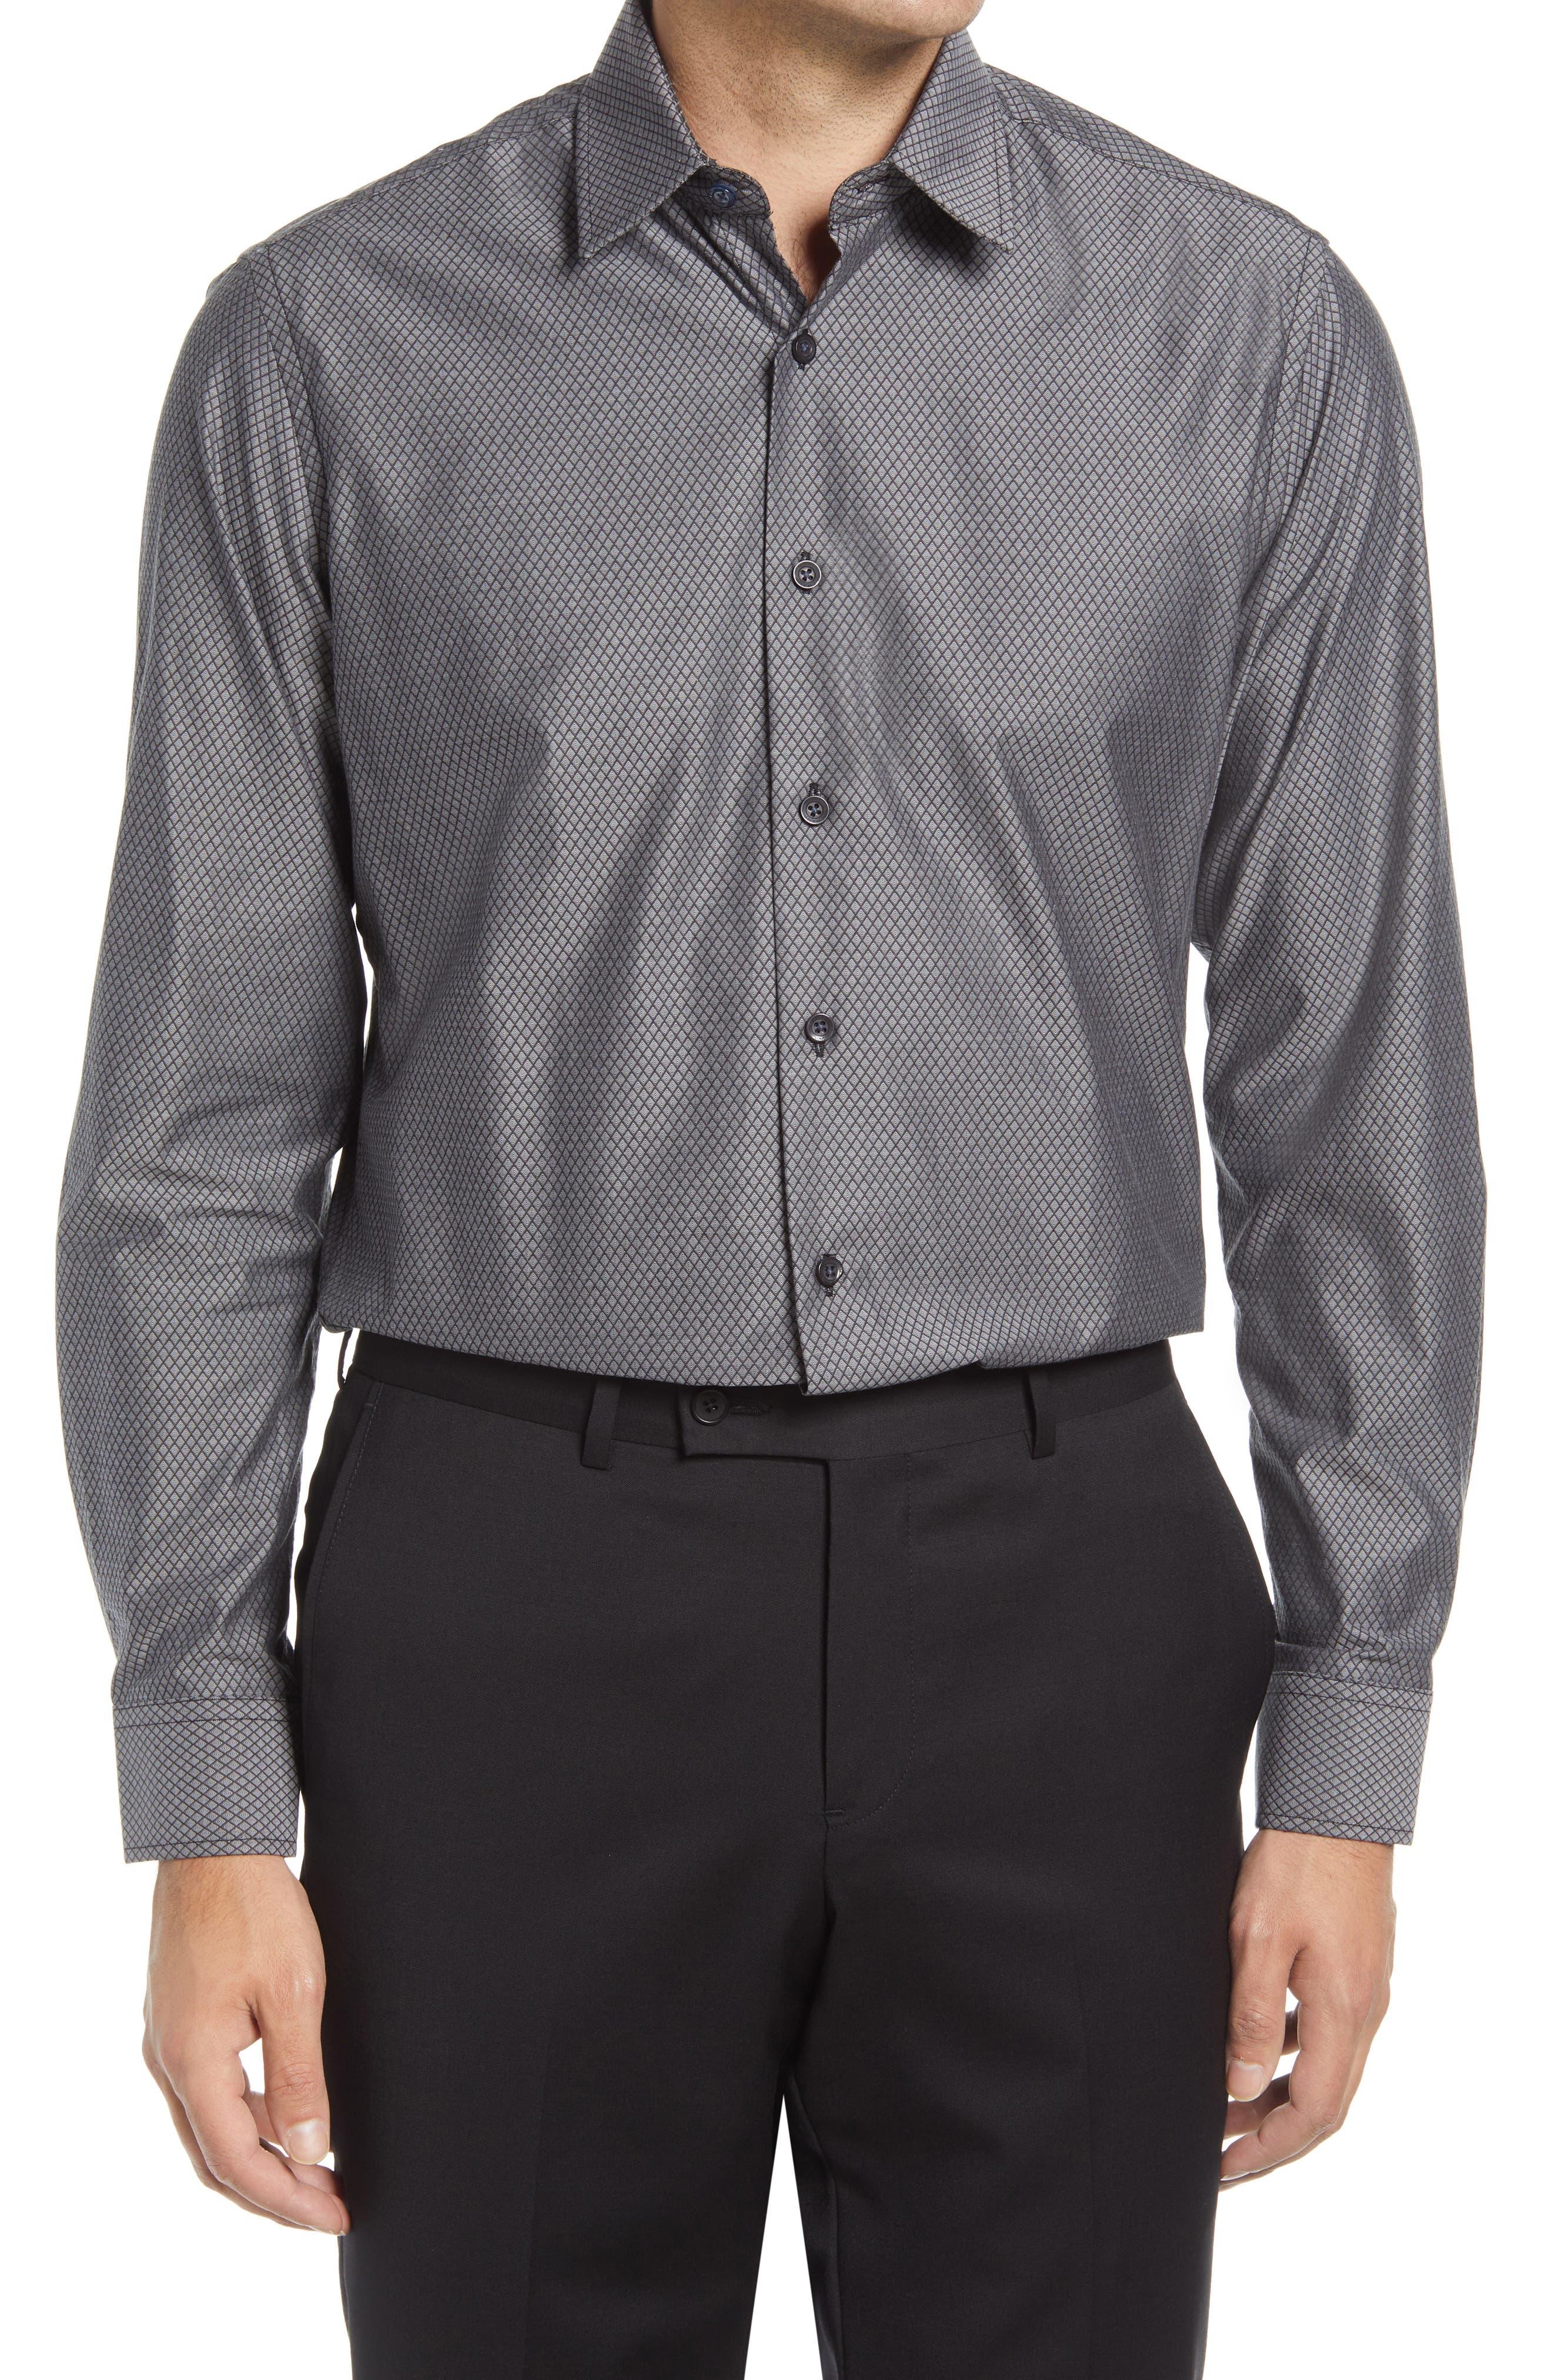 Men's Tailored Fit Diamond Dress Shirt